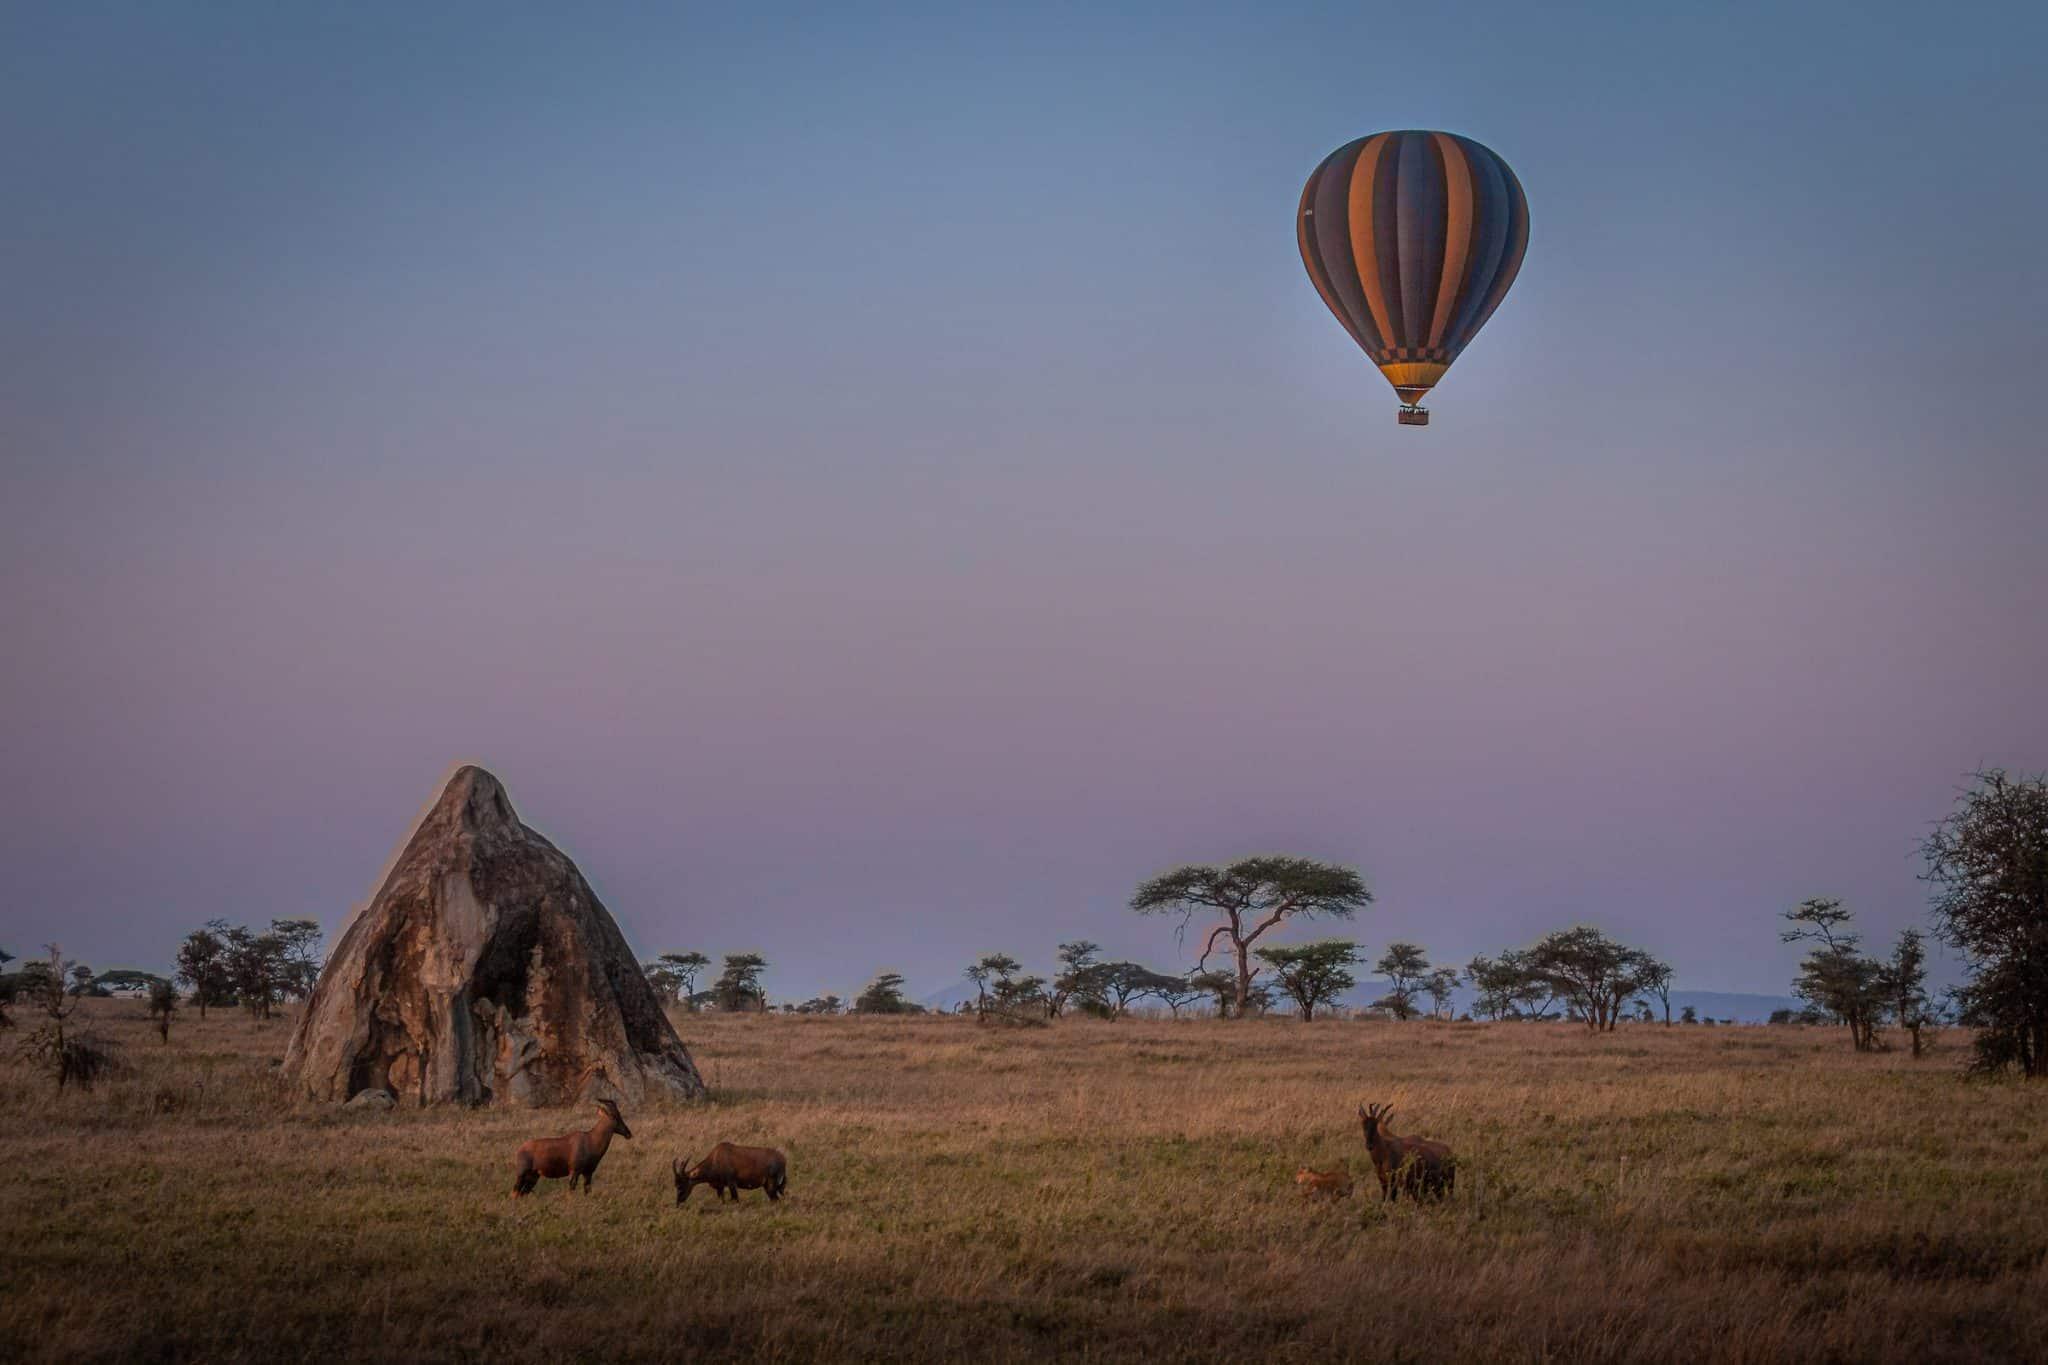 hot air balloon in Serengeti